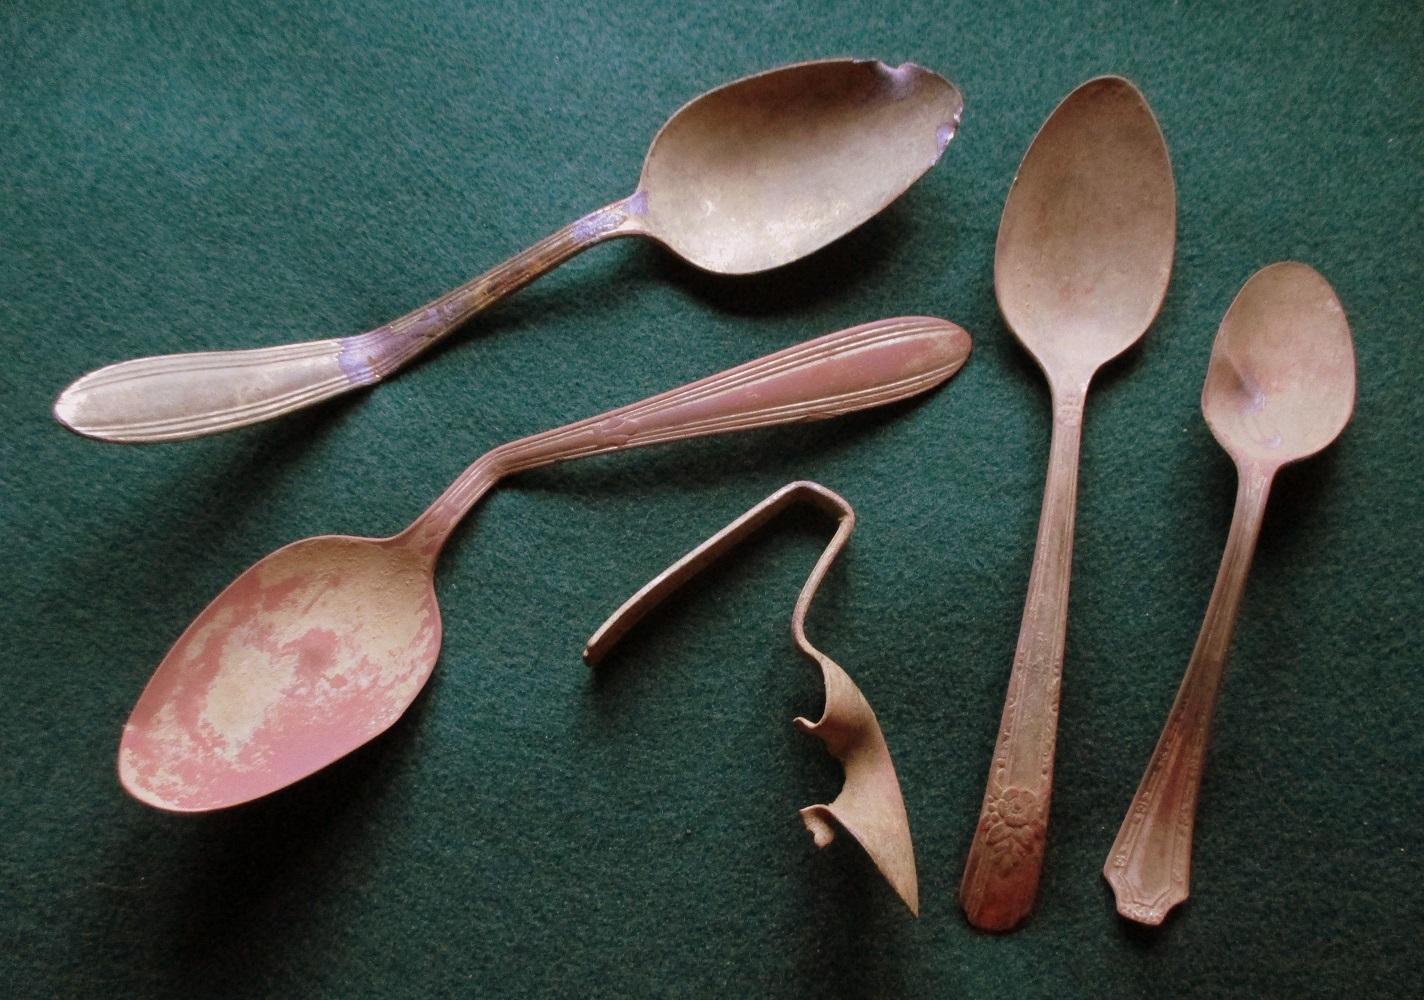 Spoons-001